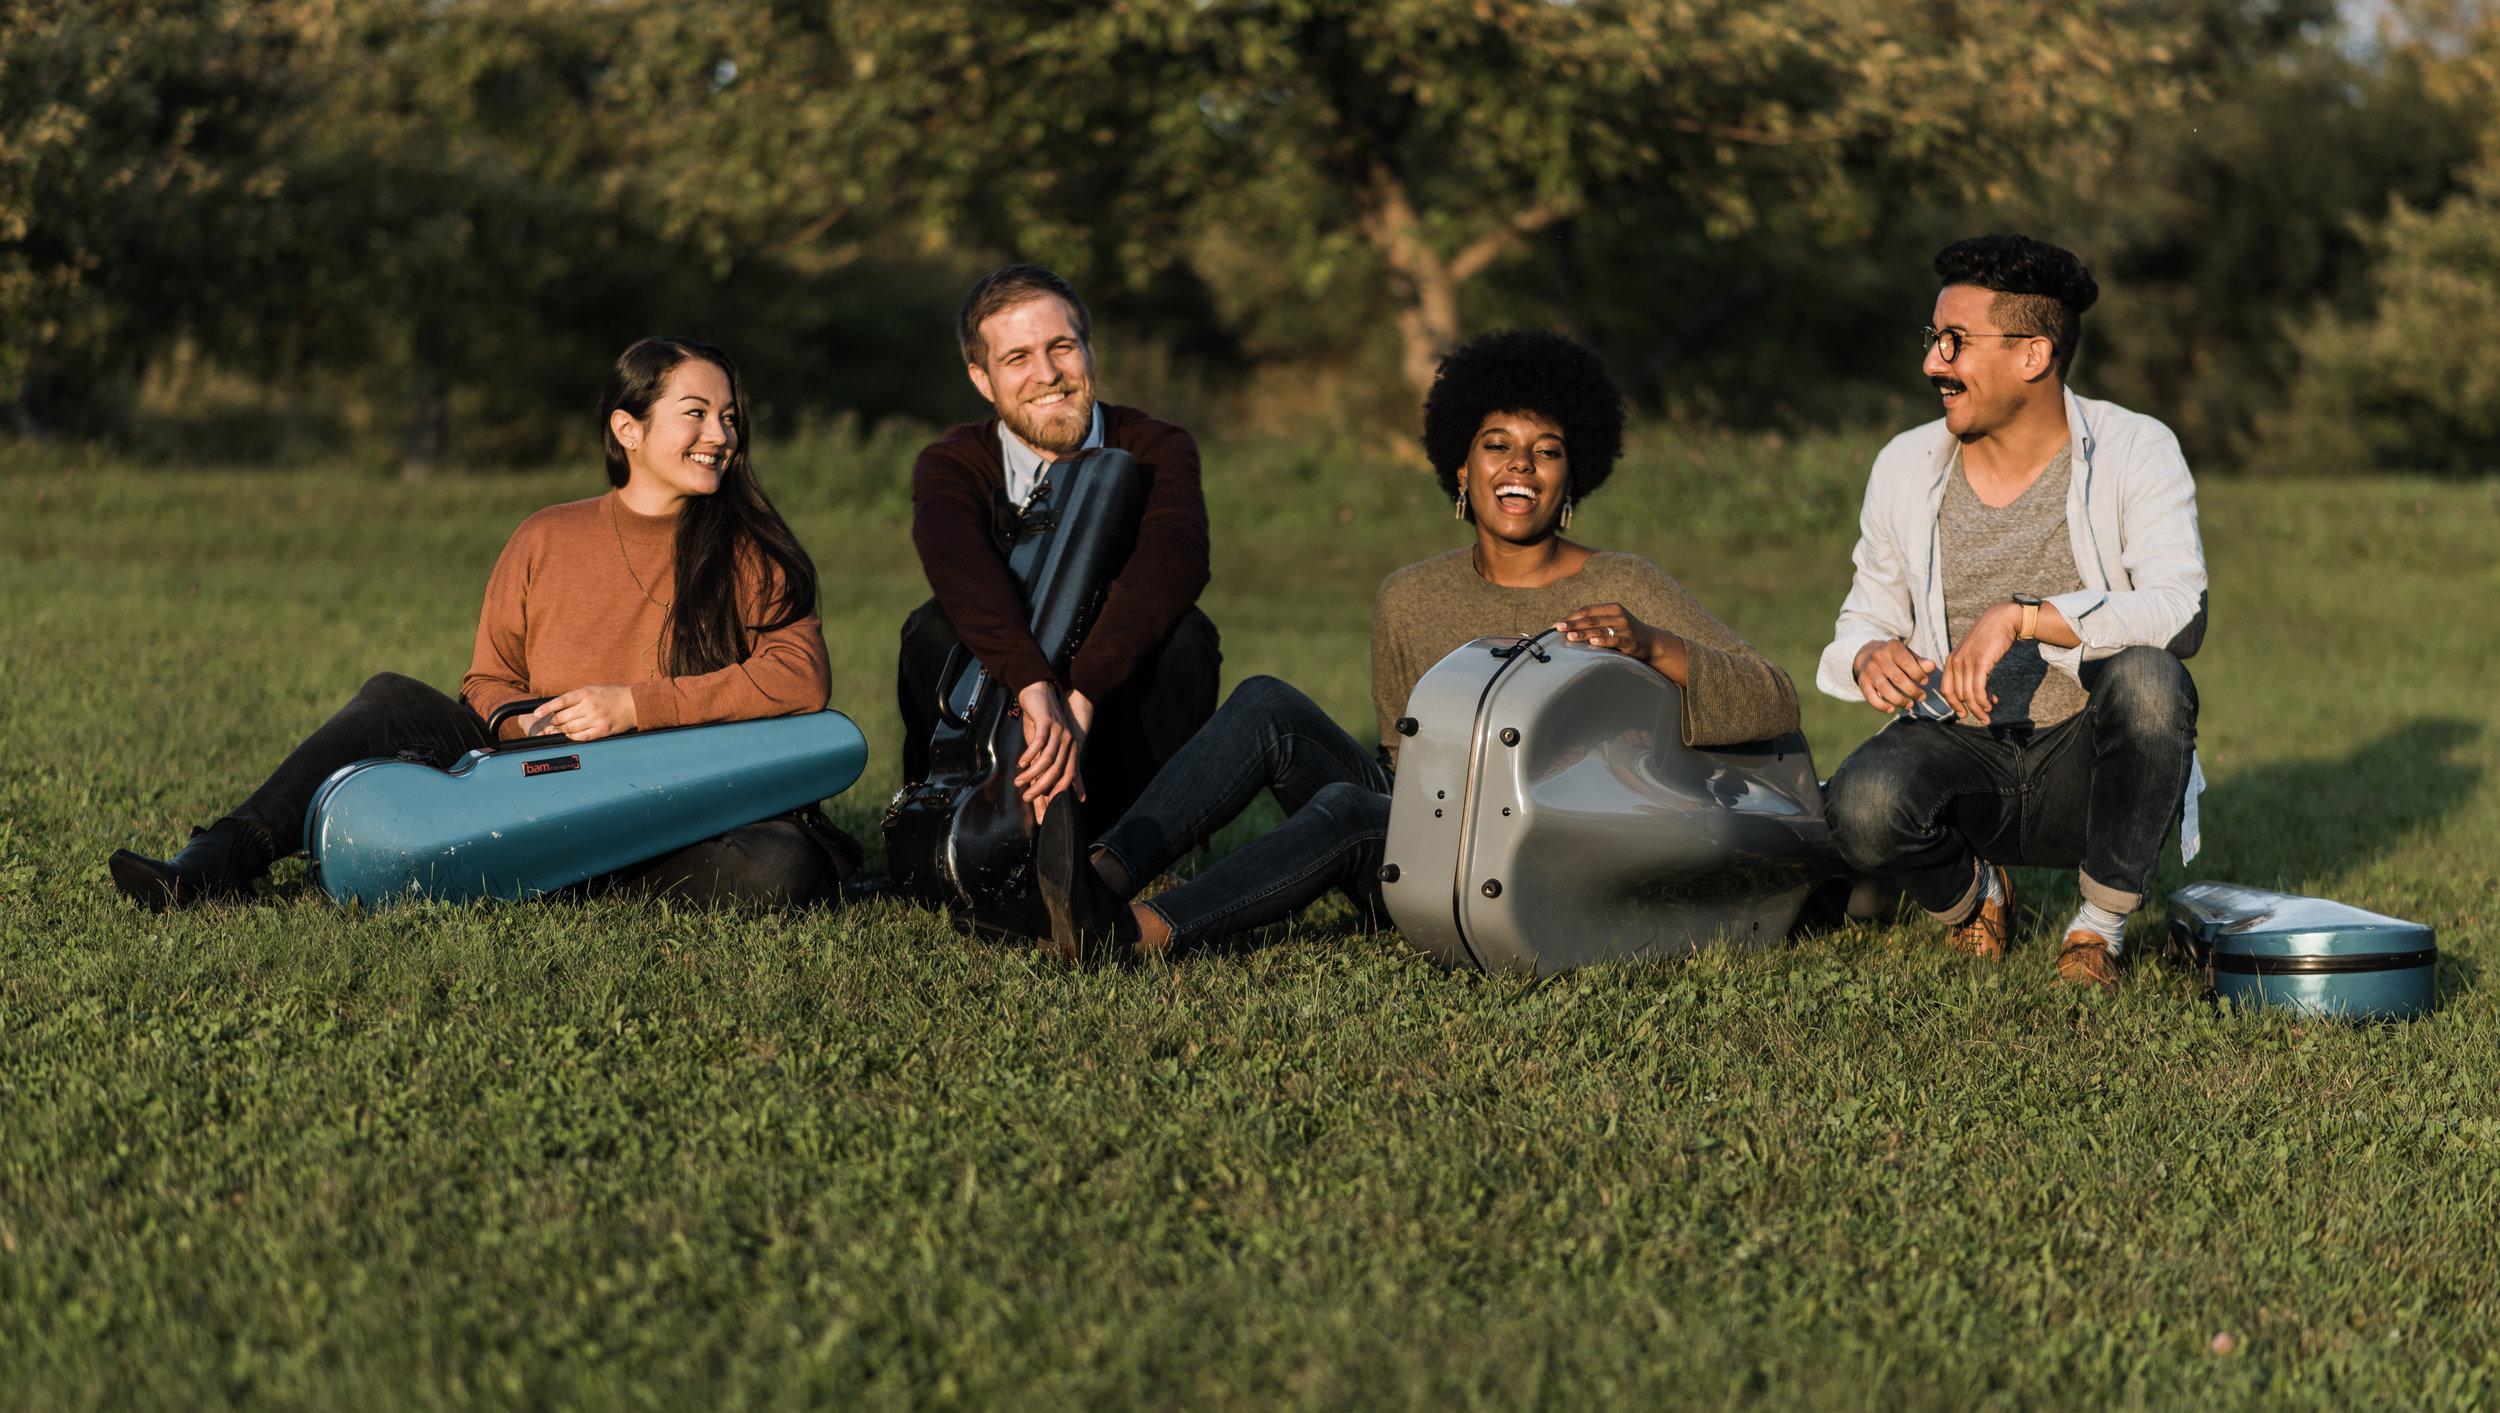 Thalea Quartet meadow hi-res.jpg